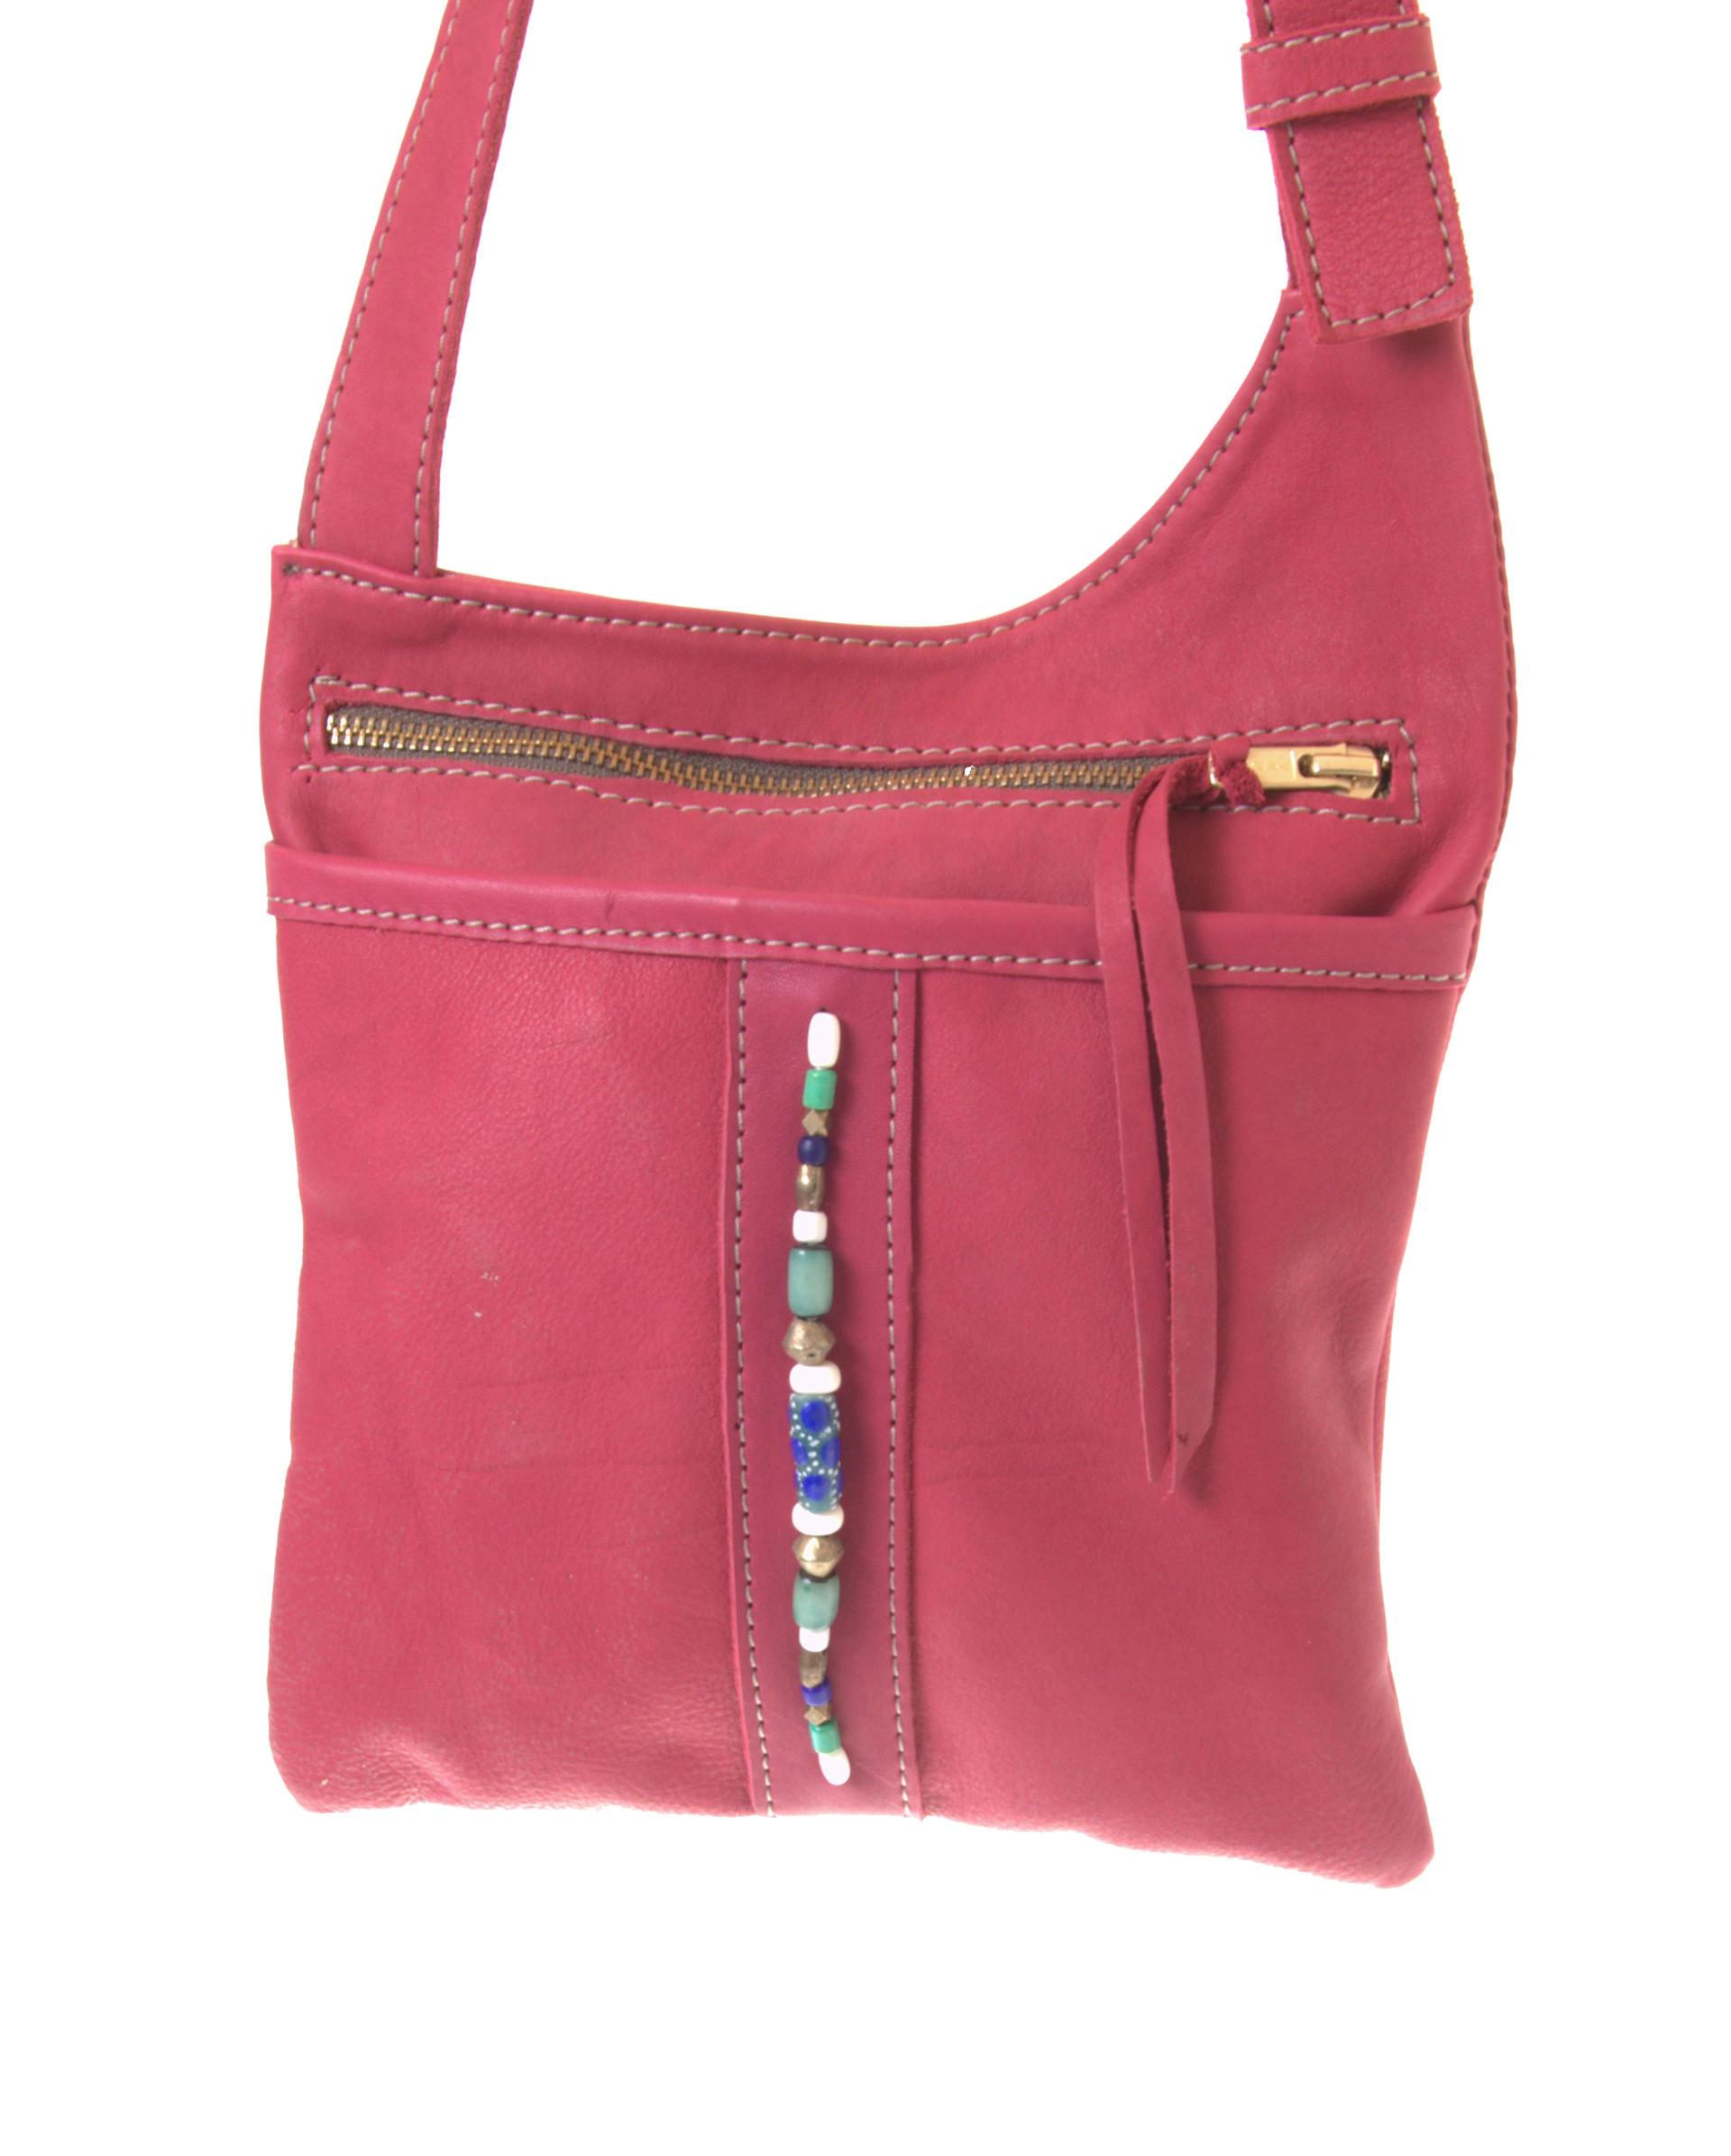 Marjo - Small cross body bag - Jackal and Hide - Red